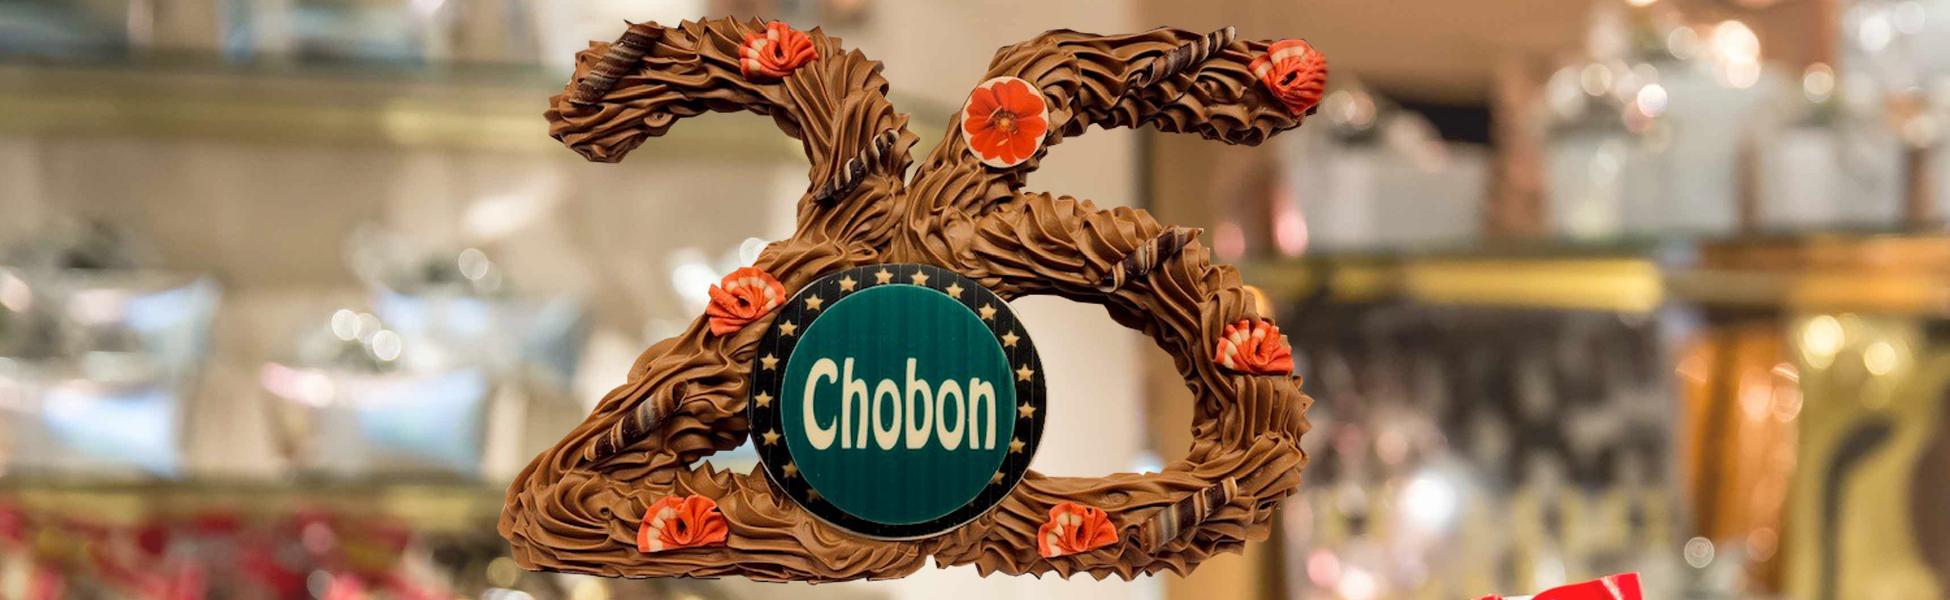 Bonbonnerie & chocolaterie Chobon!